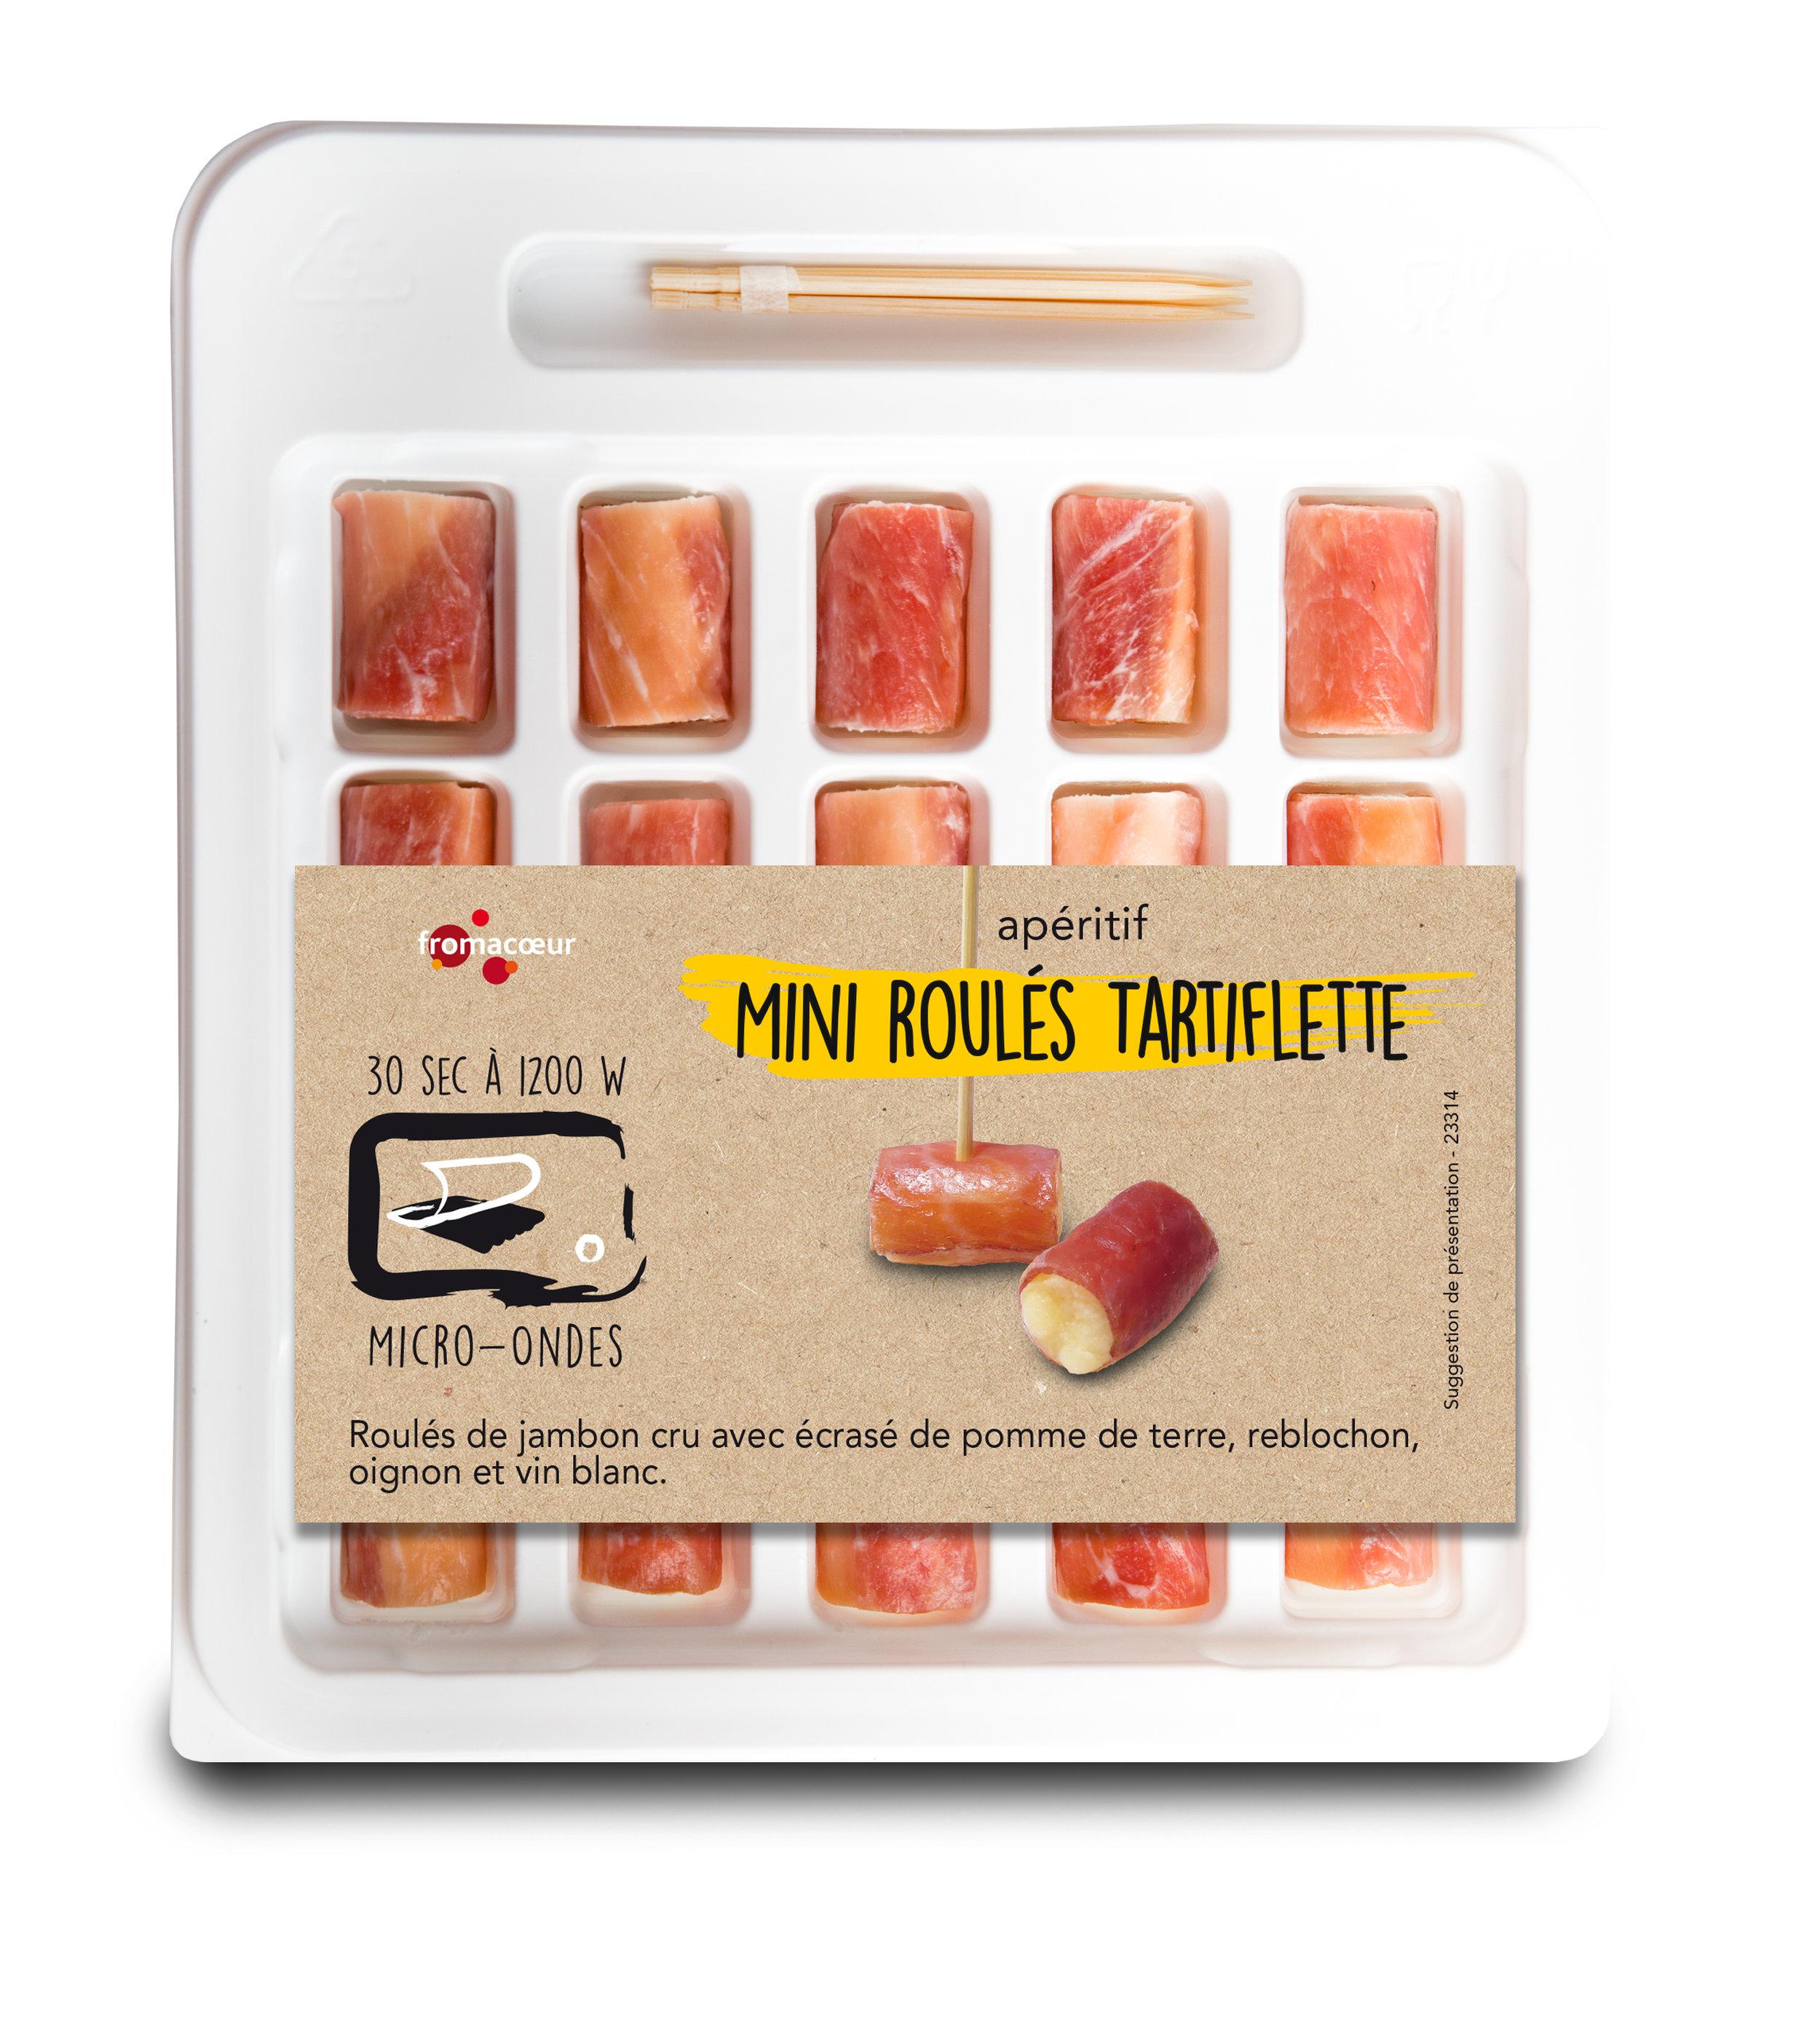 Mini tartiflette roulades